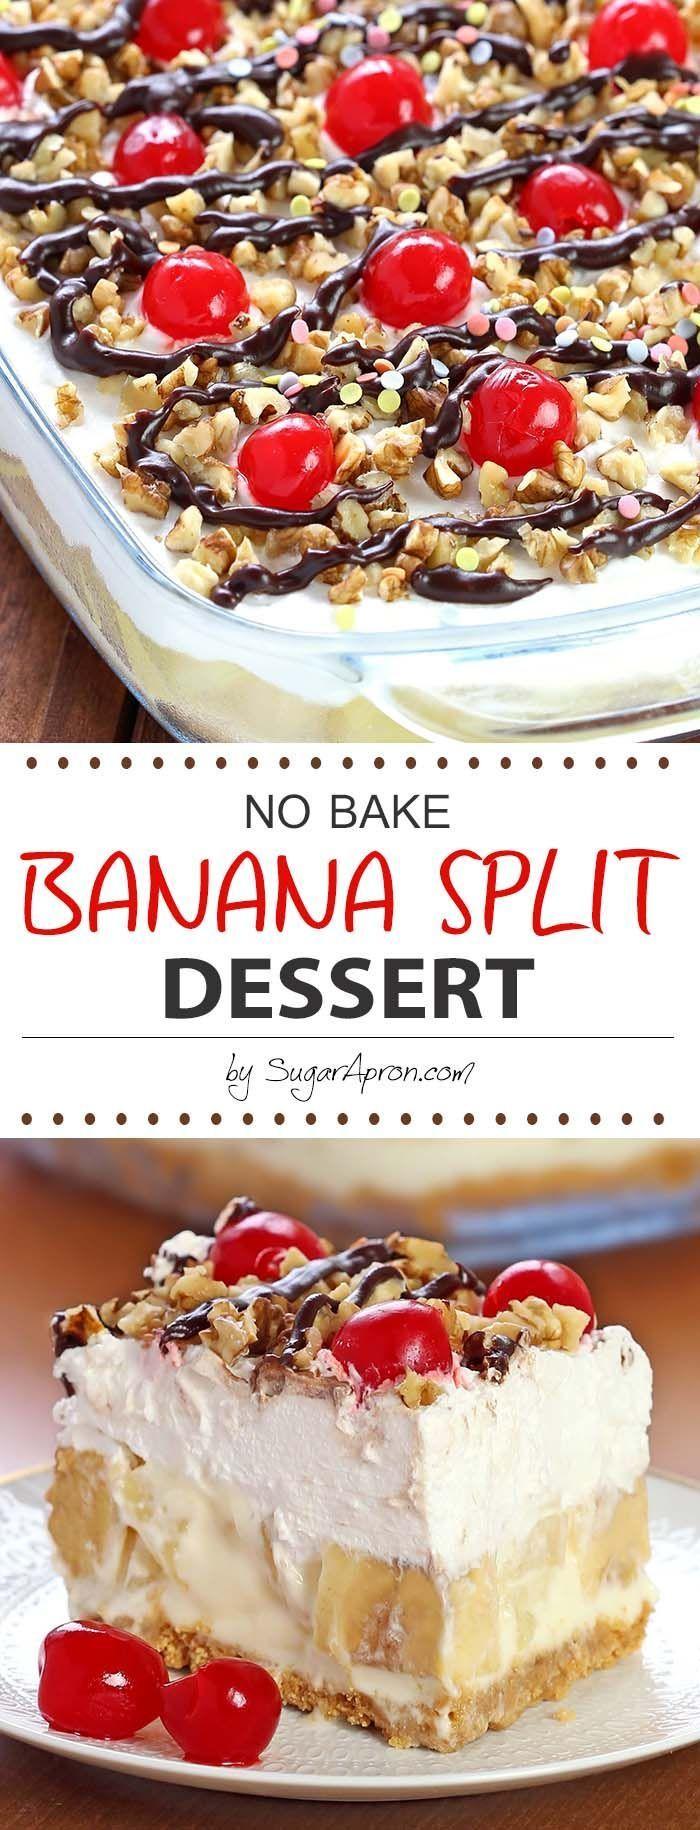 No Bake Banana Split Dessert #desserts